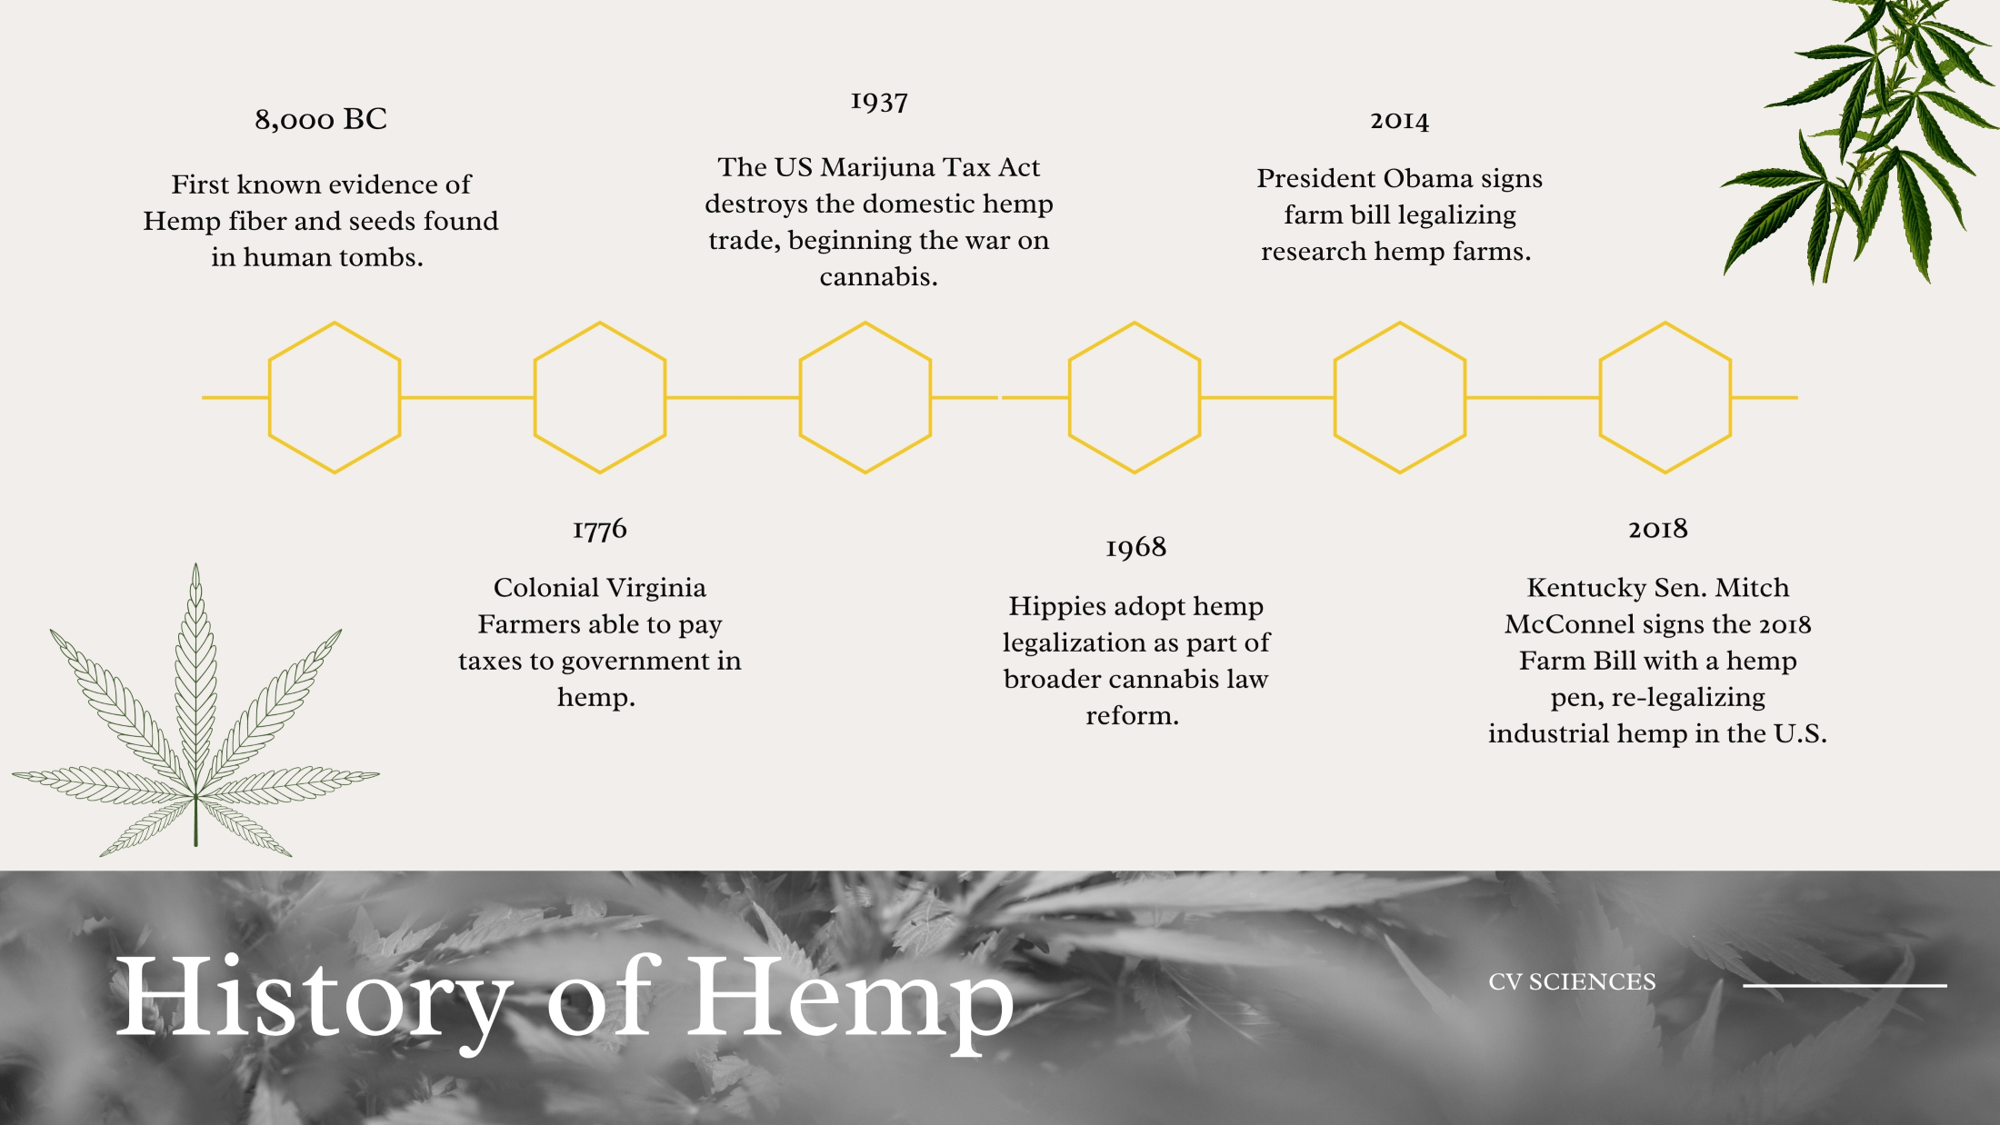 history of hemp timeline